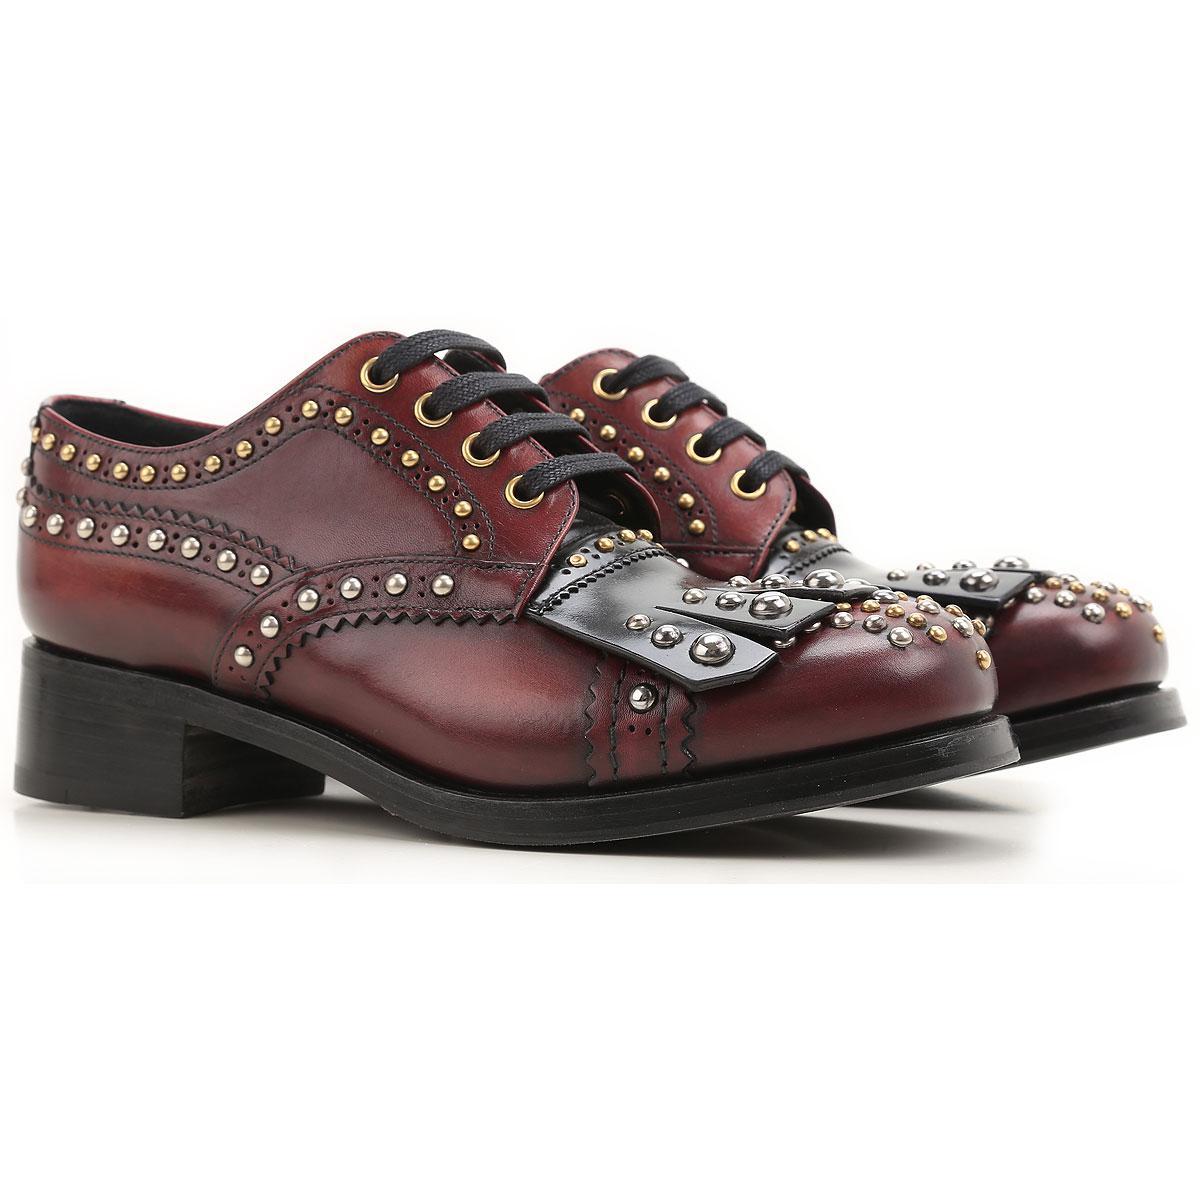 Lyst - Prada Shoes For Women